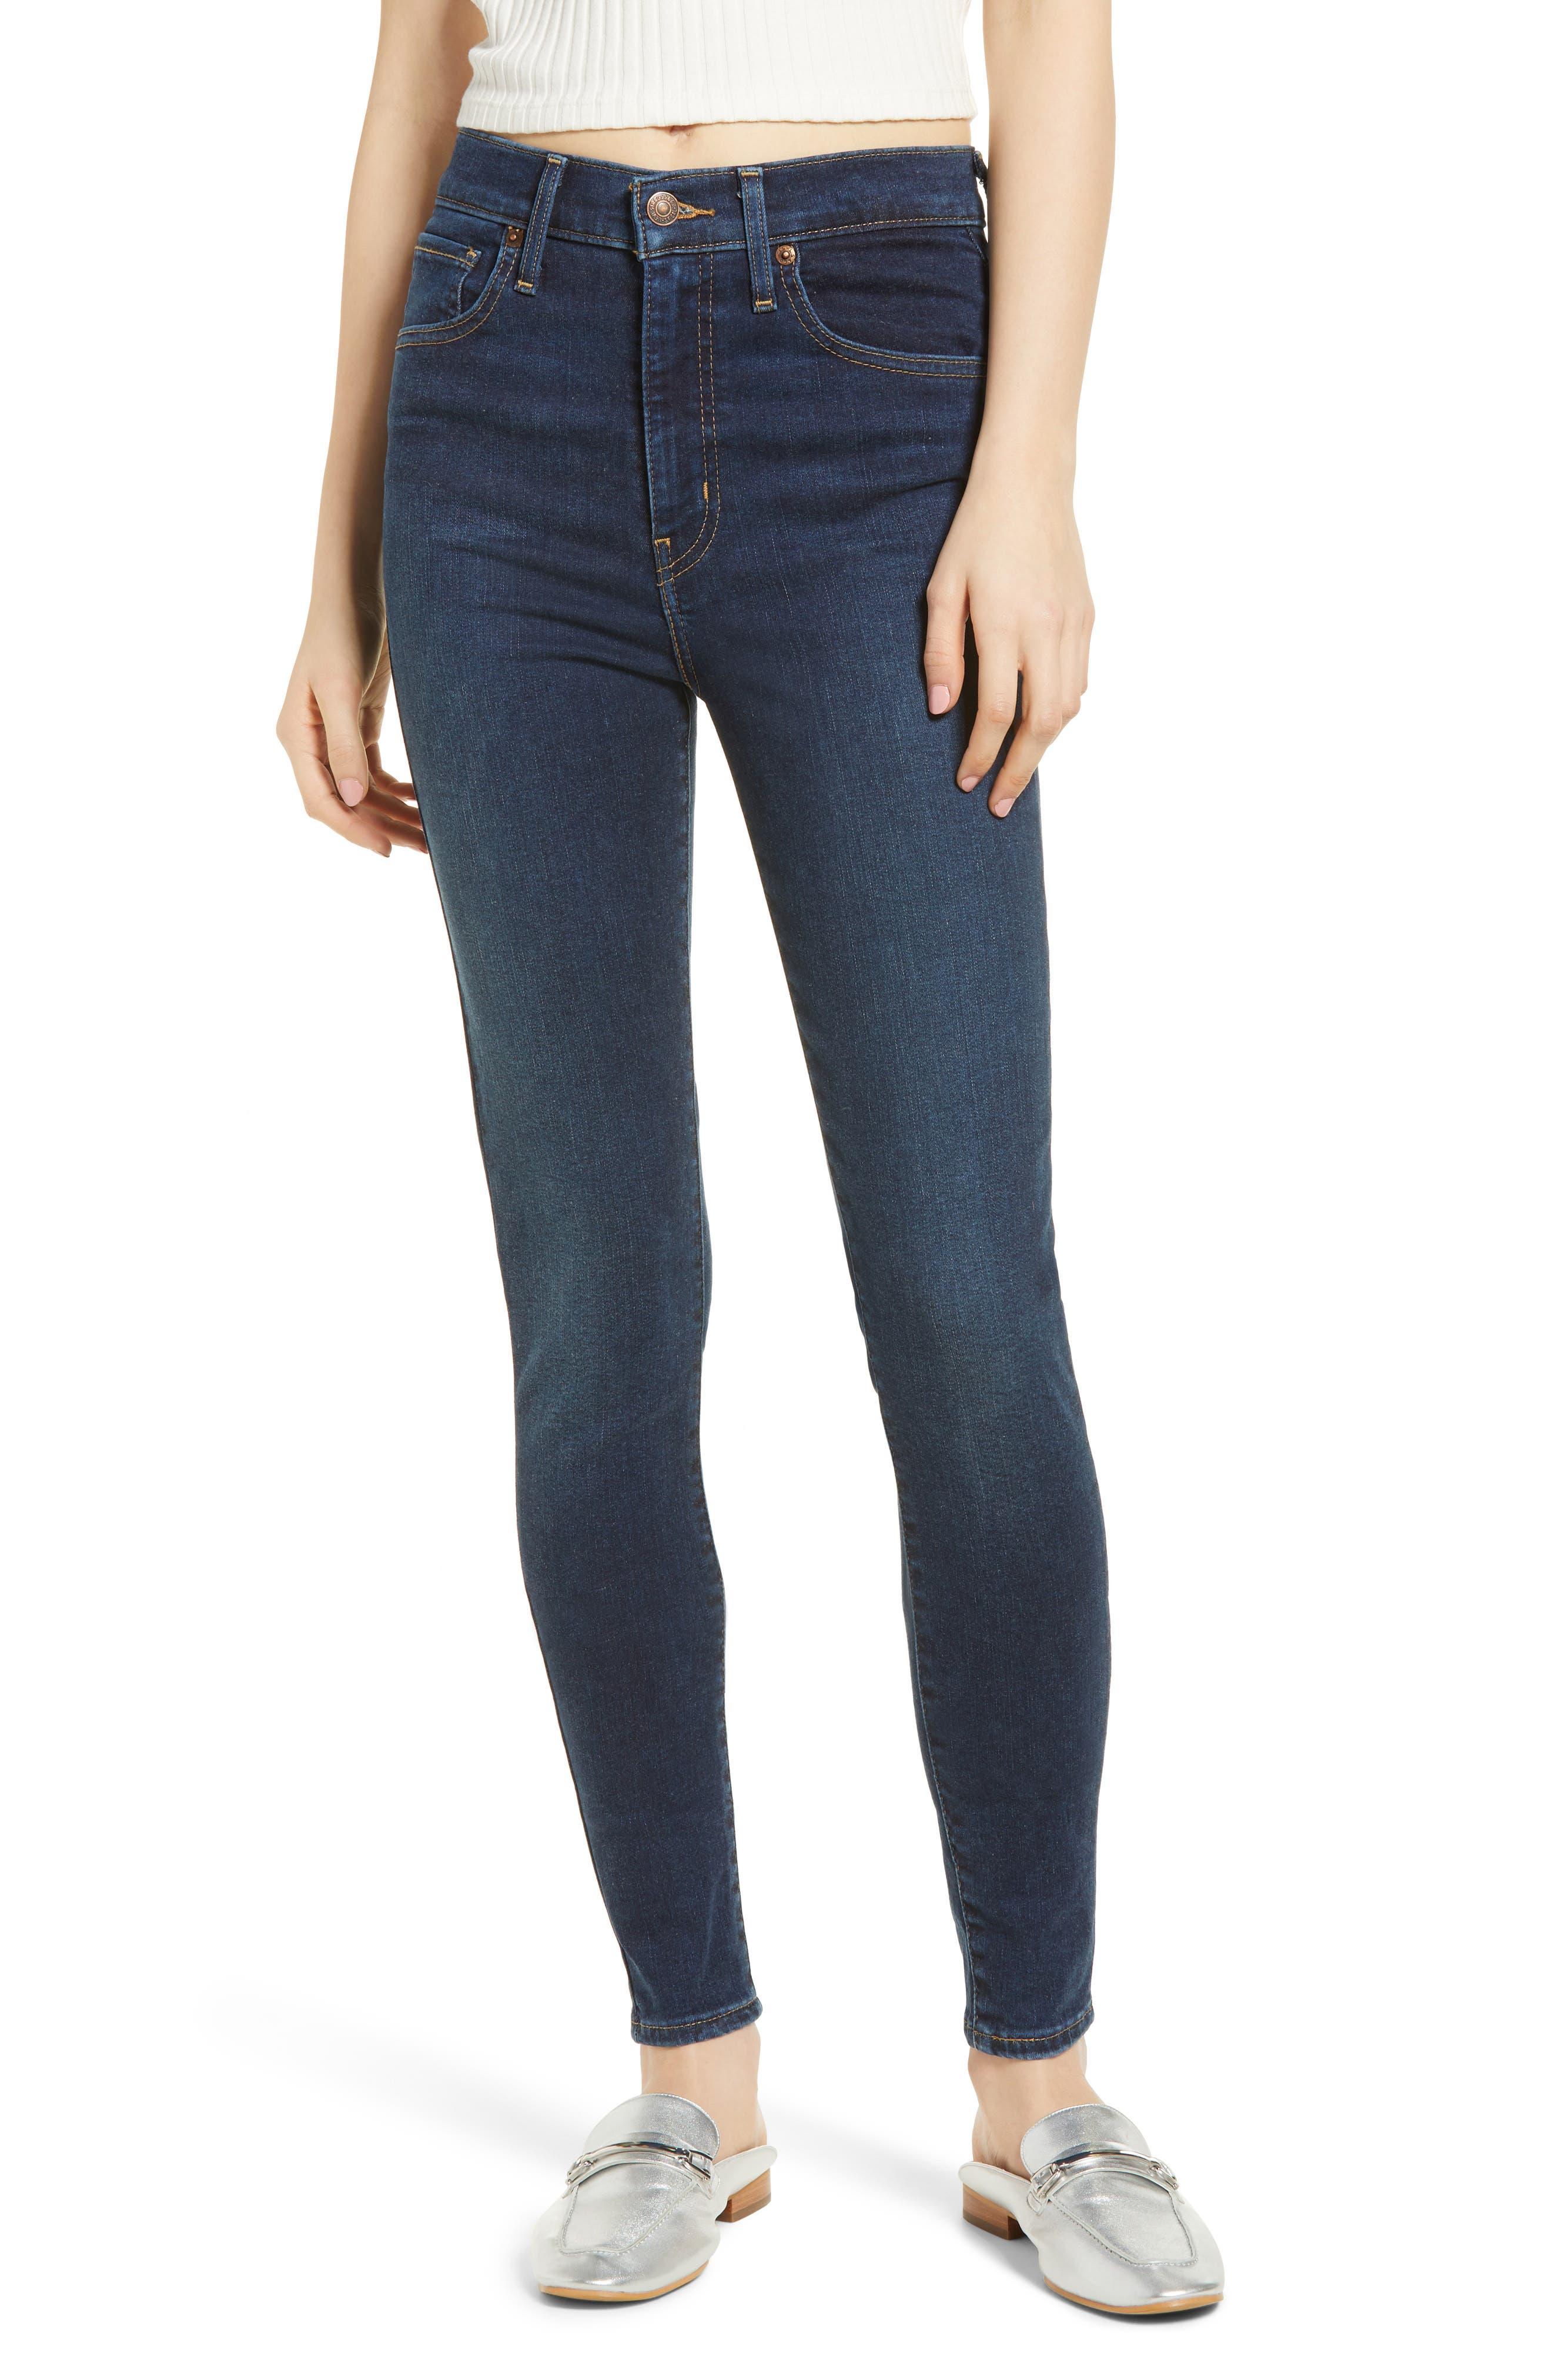 LEVI'S<SUP>®</SUP>, Mile High Super Skinny Jeans, Main thumbnail 1, color, JET SETTER